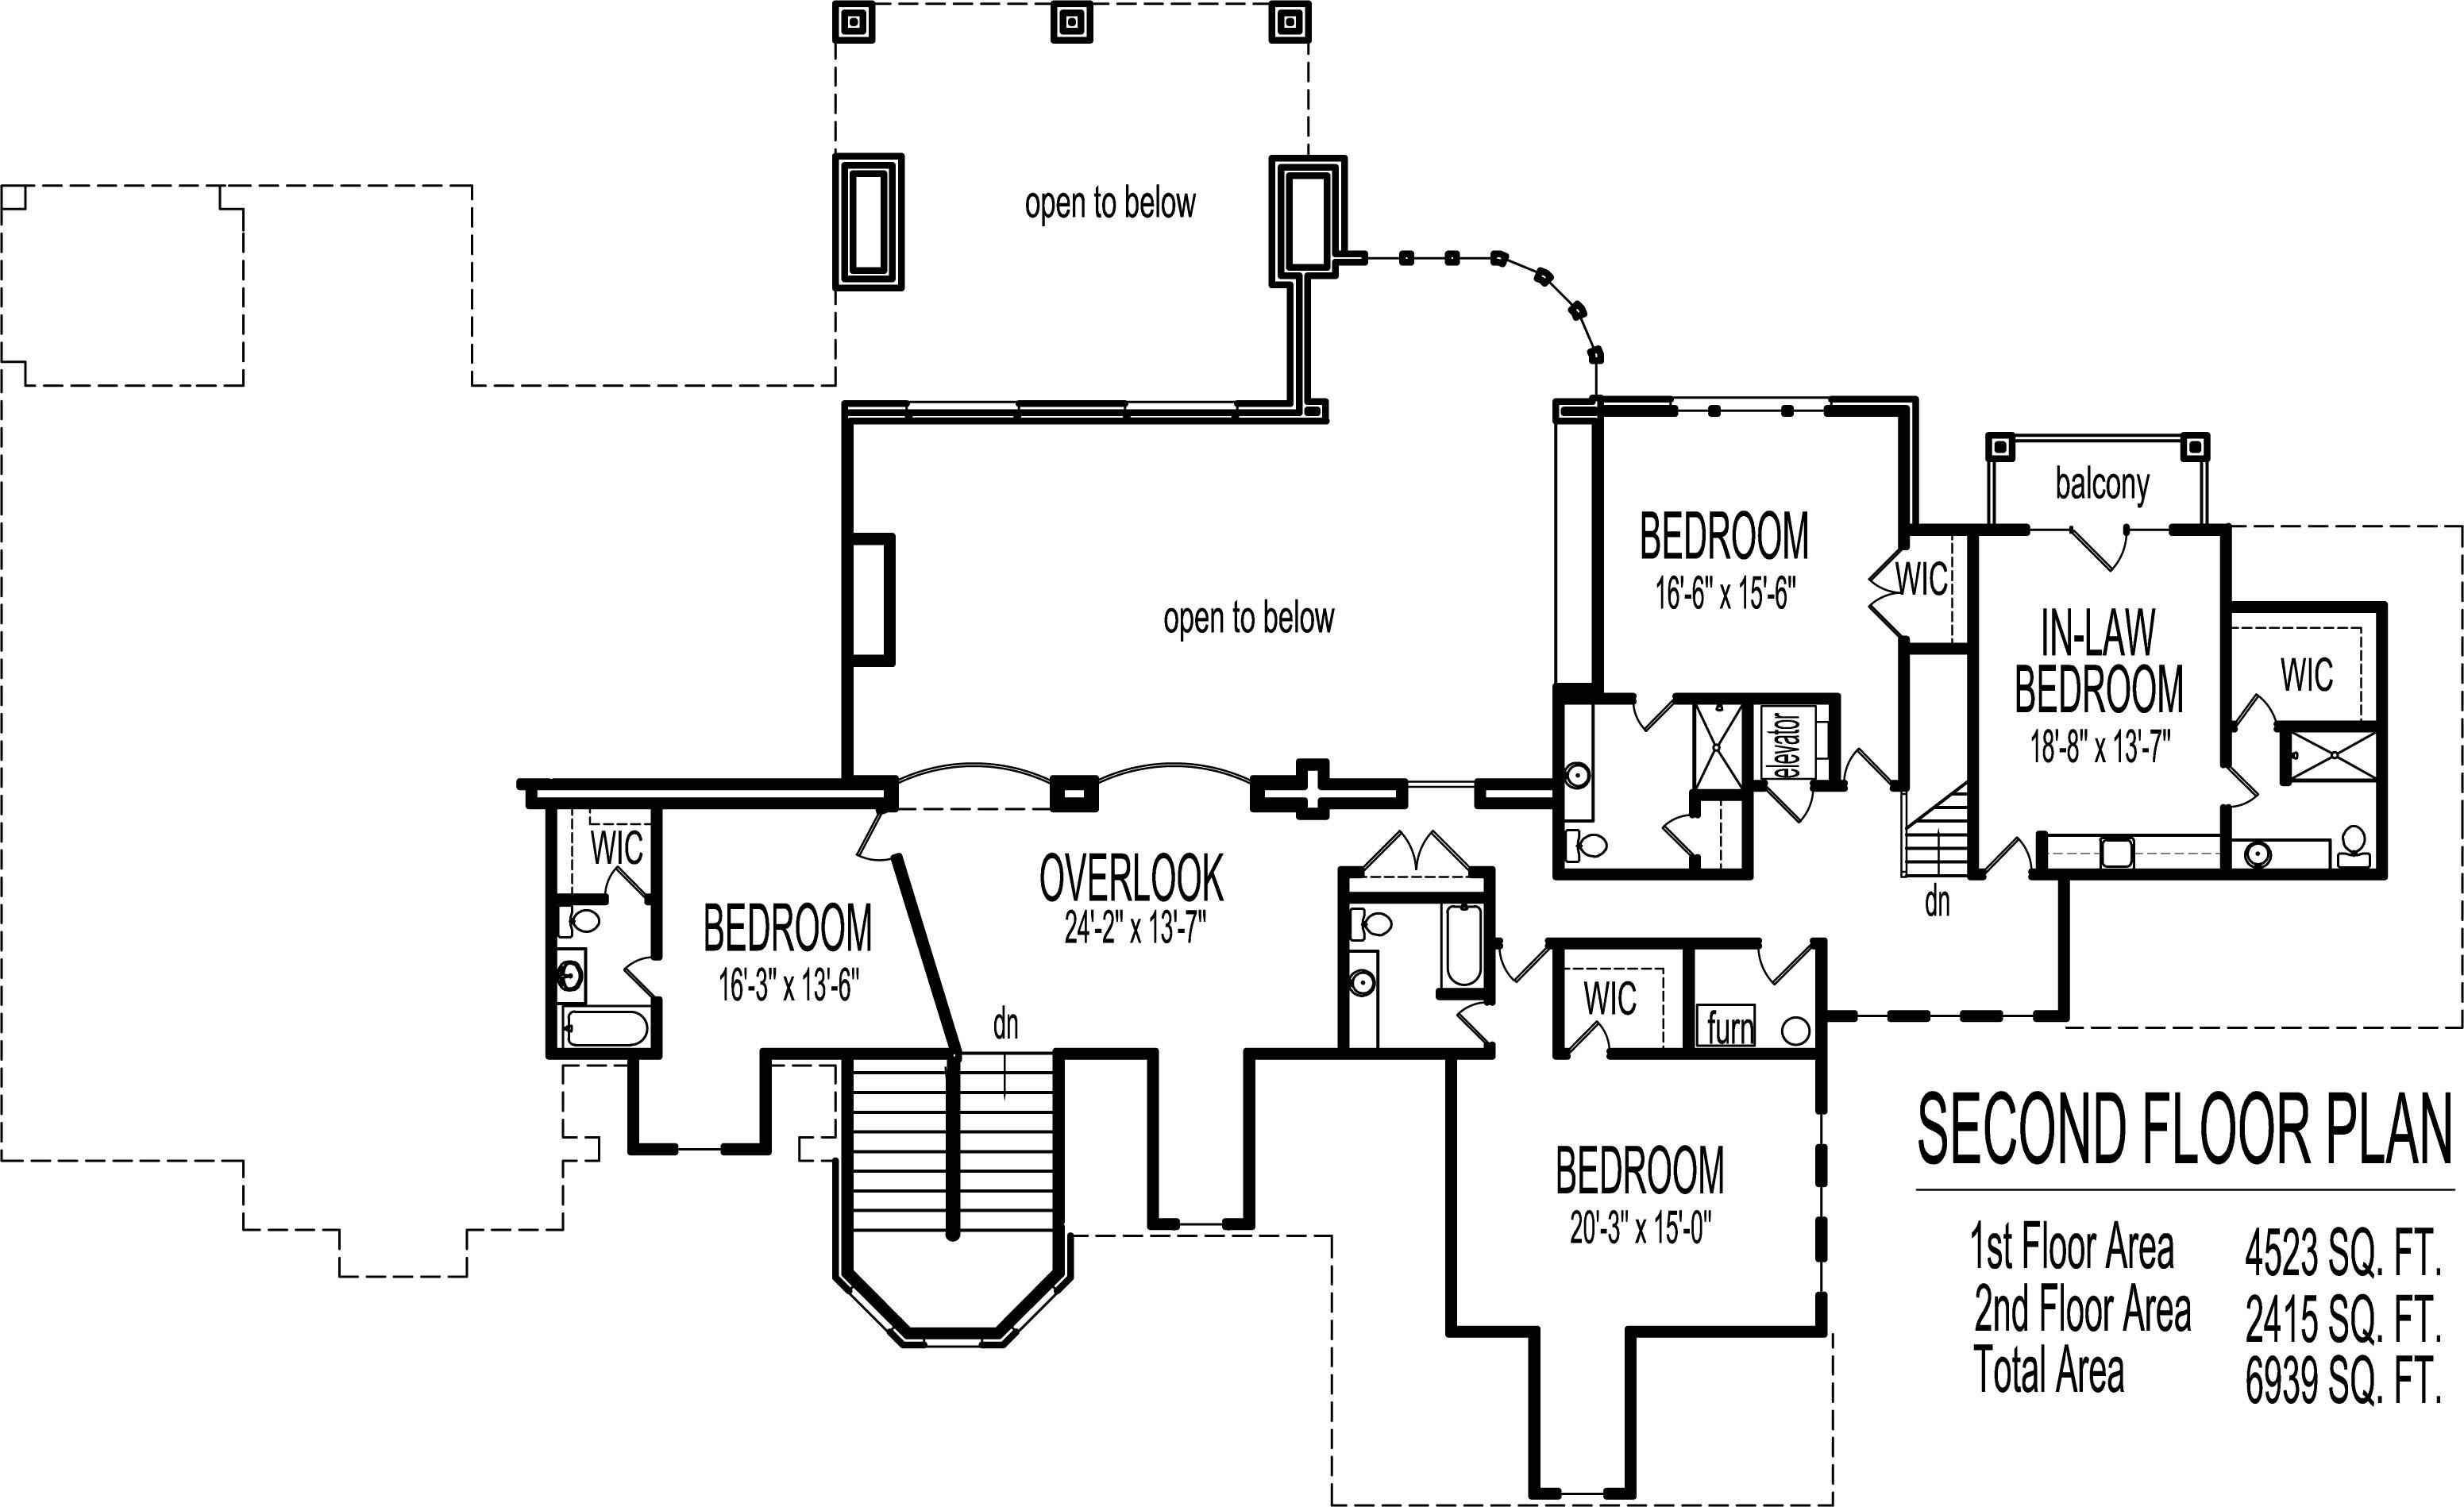 Mansion House Floor Plans Blueprints 6 Bedroom 2 Story